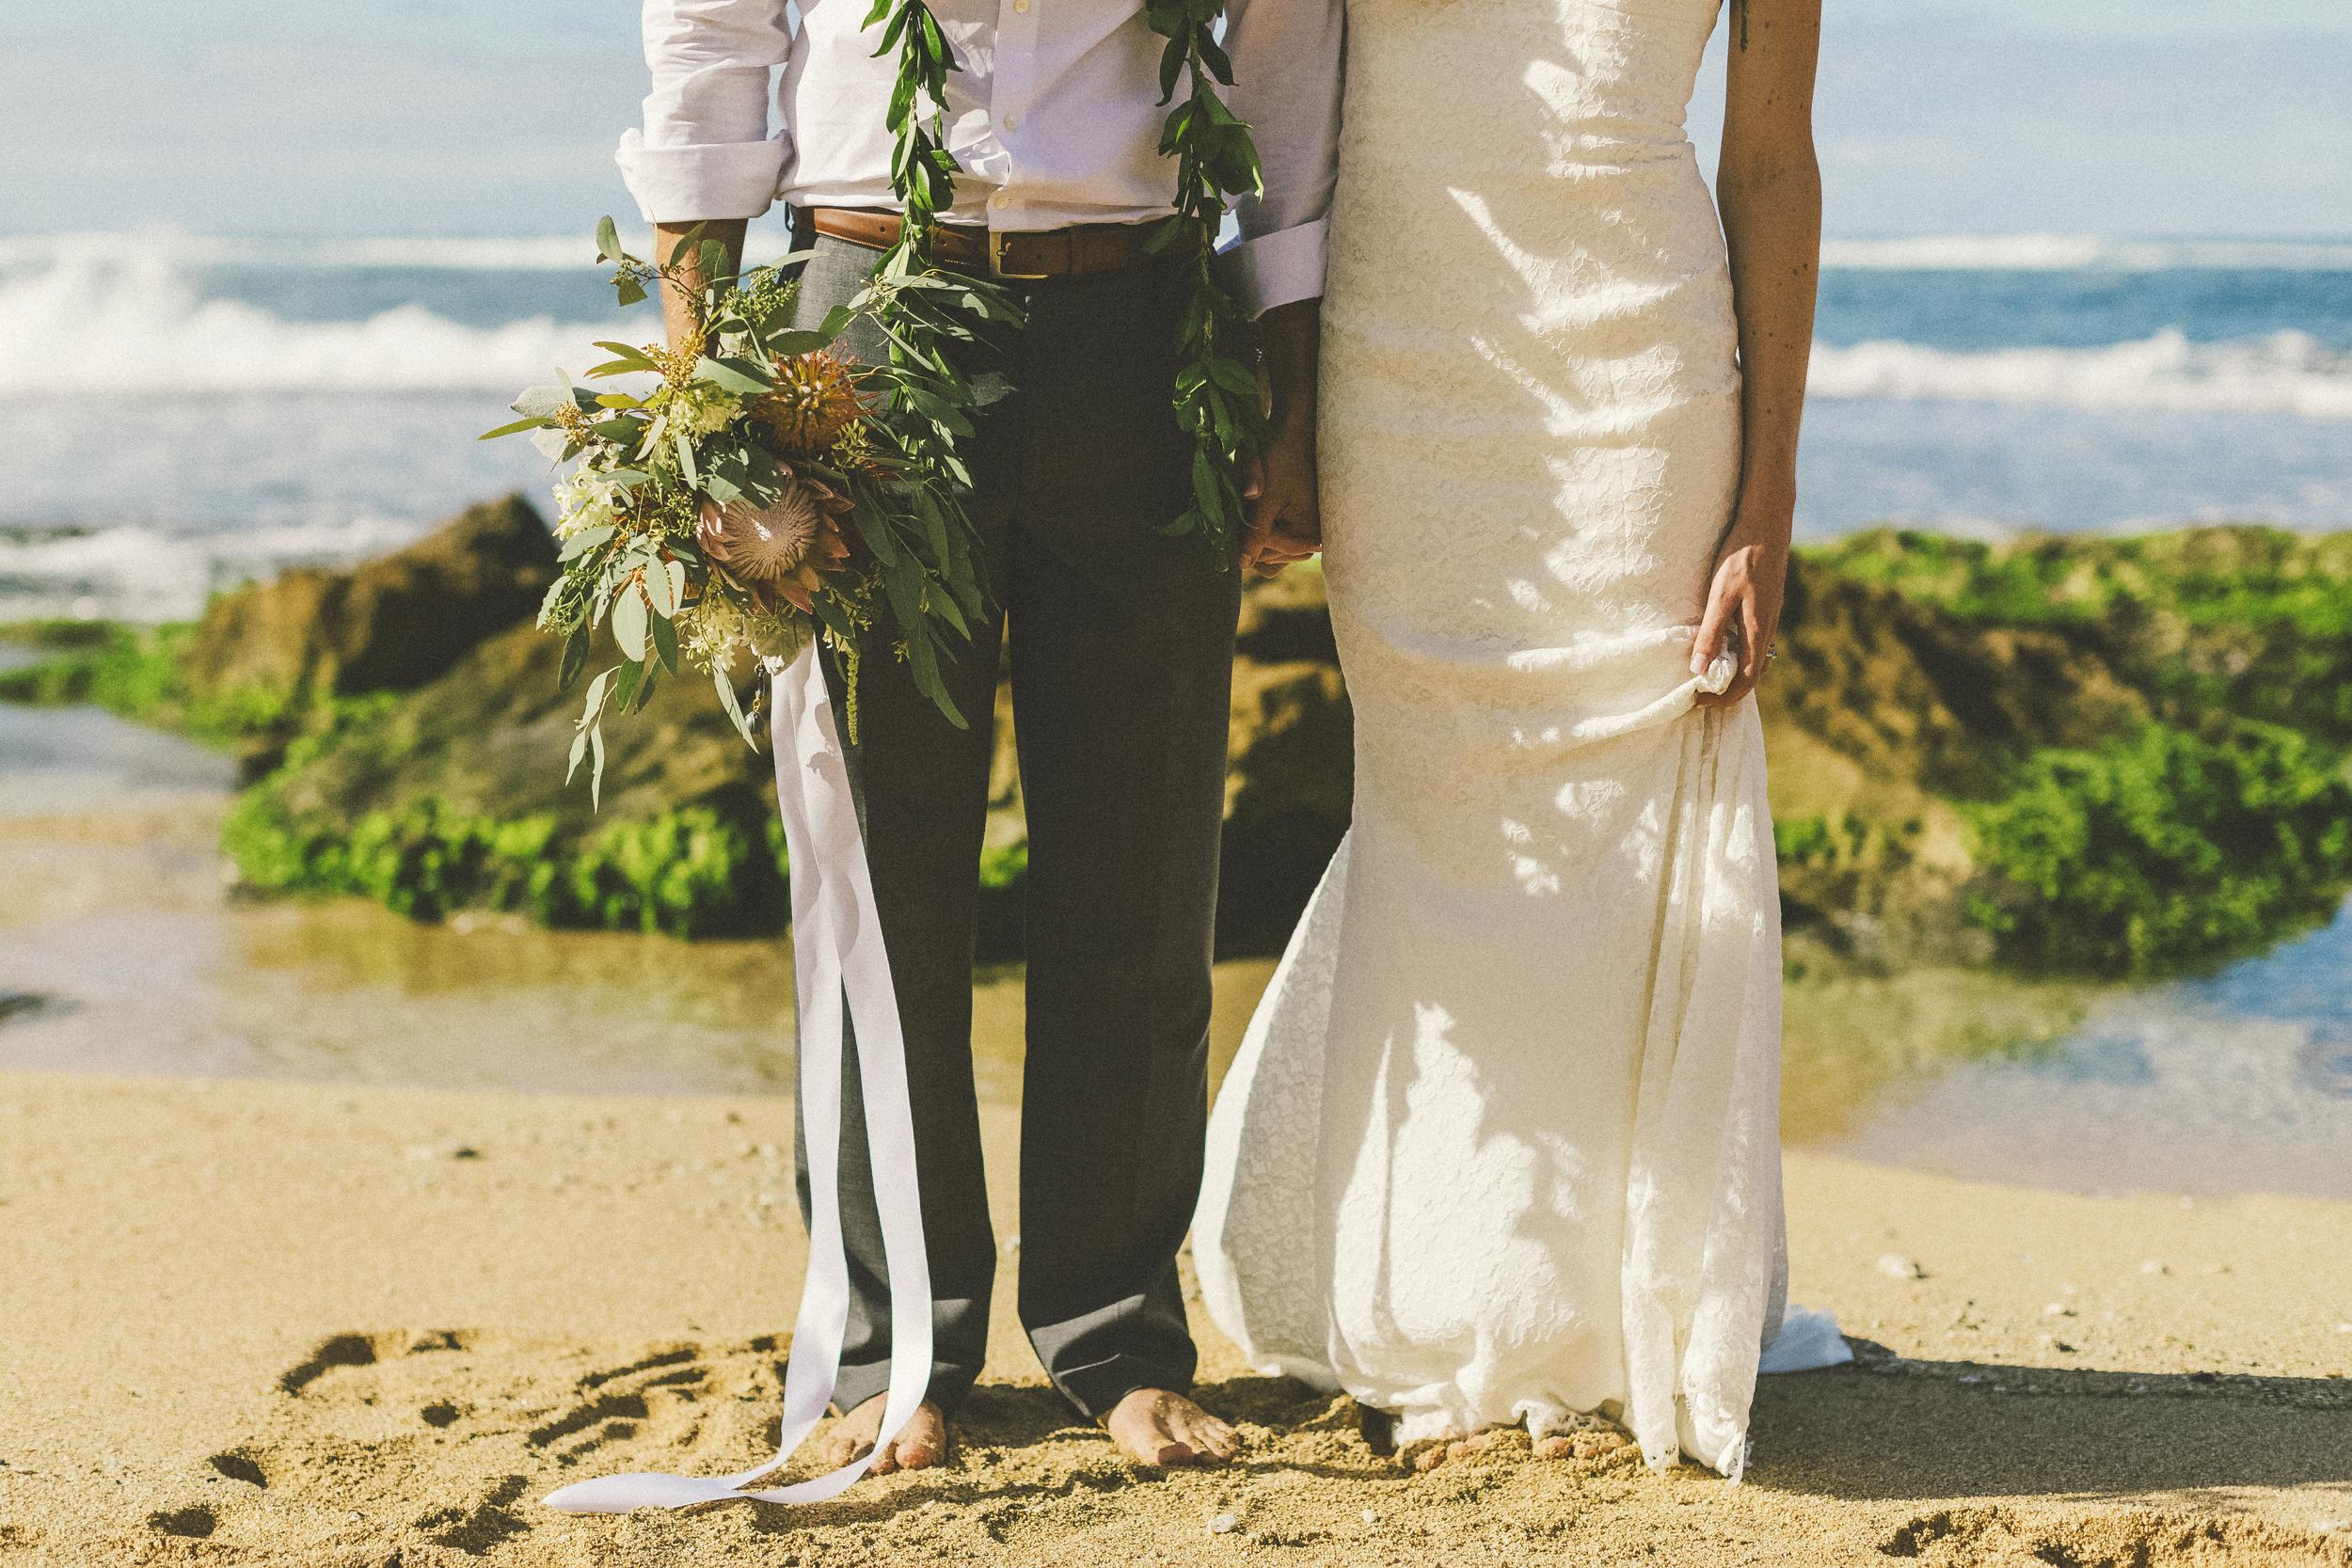 angie-diaz-photography-maui-wedding-80.jpg